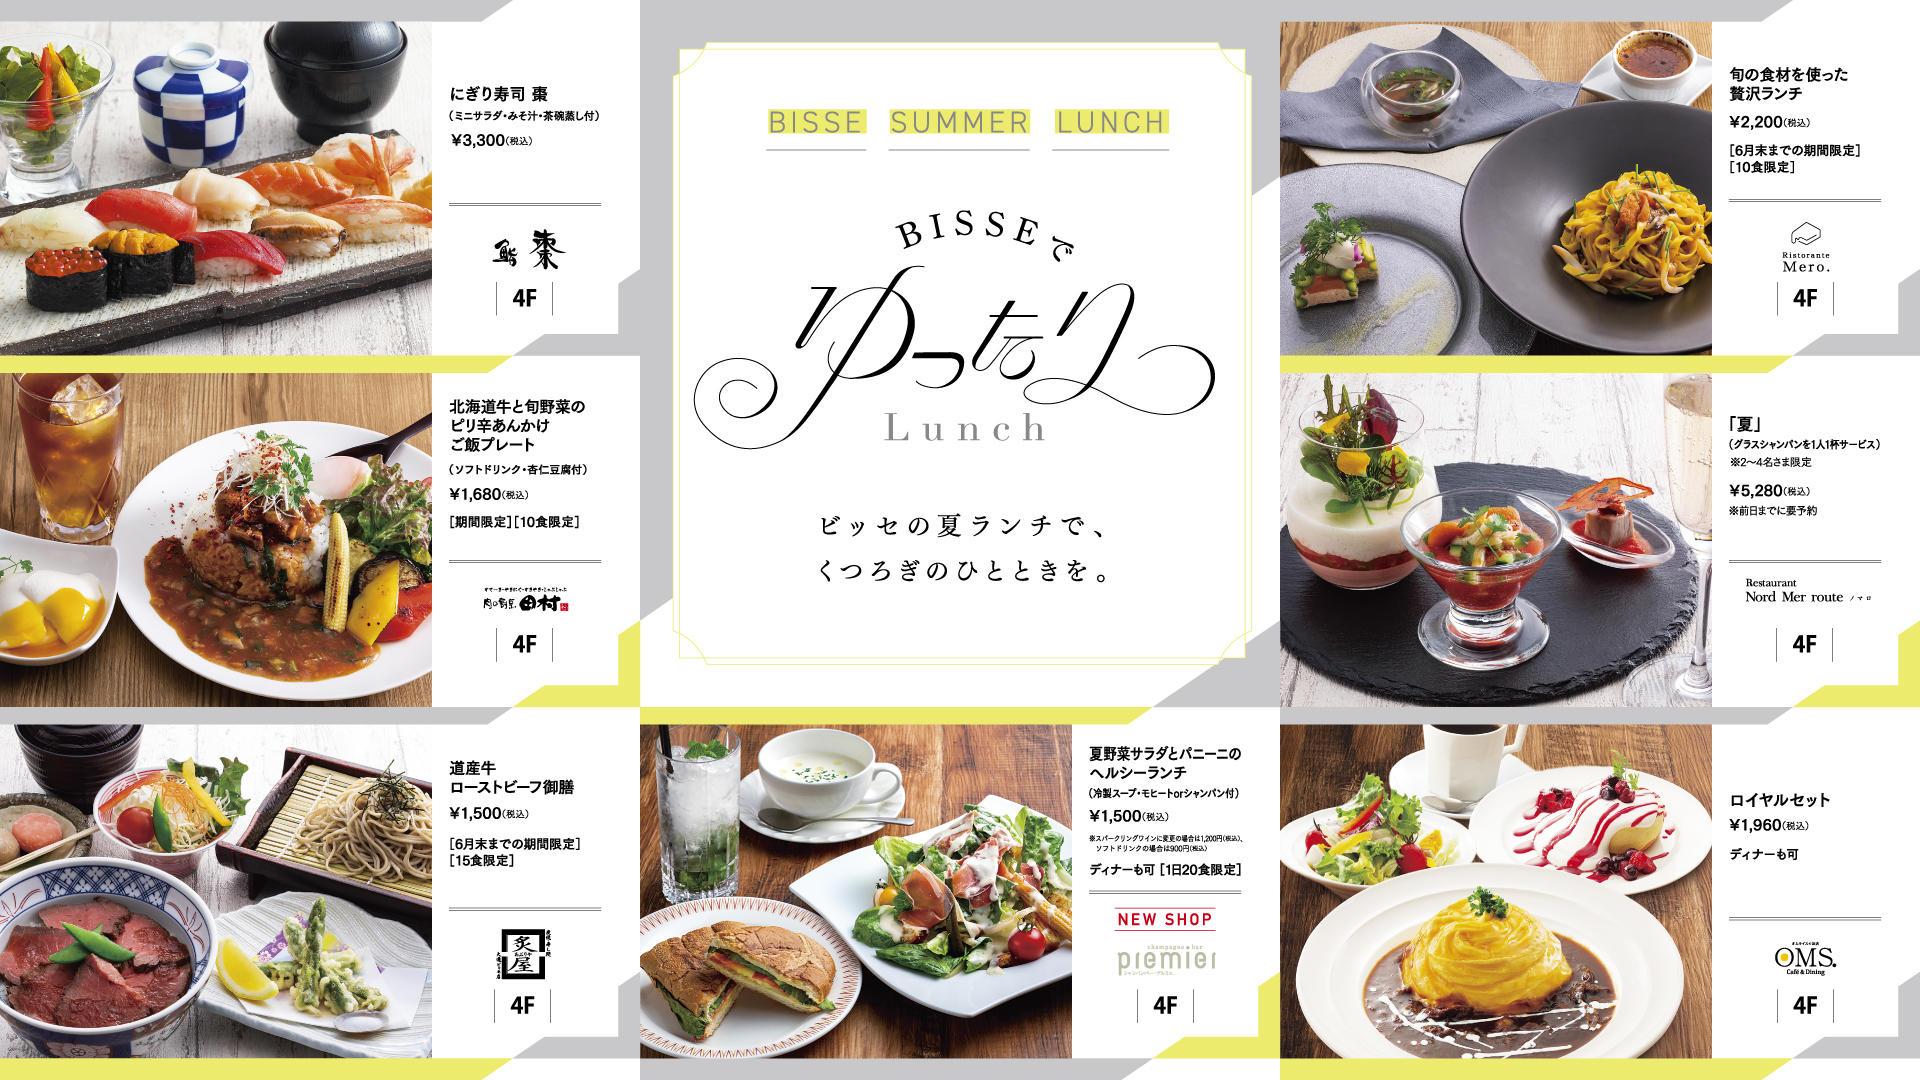 https://www.odori-bisse.com/info/news_210521_img2.jpg